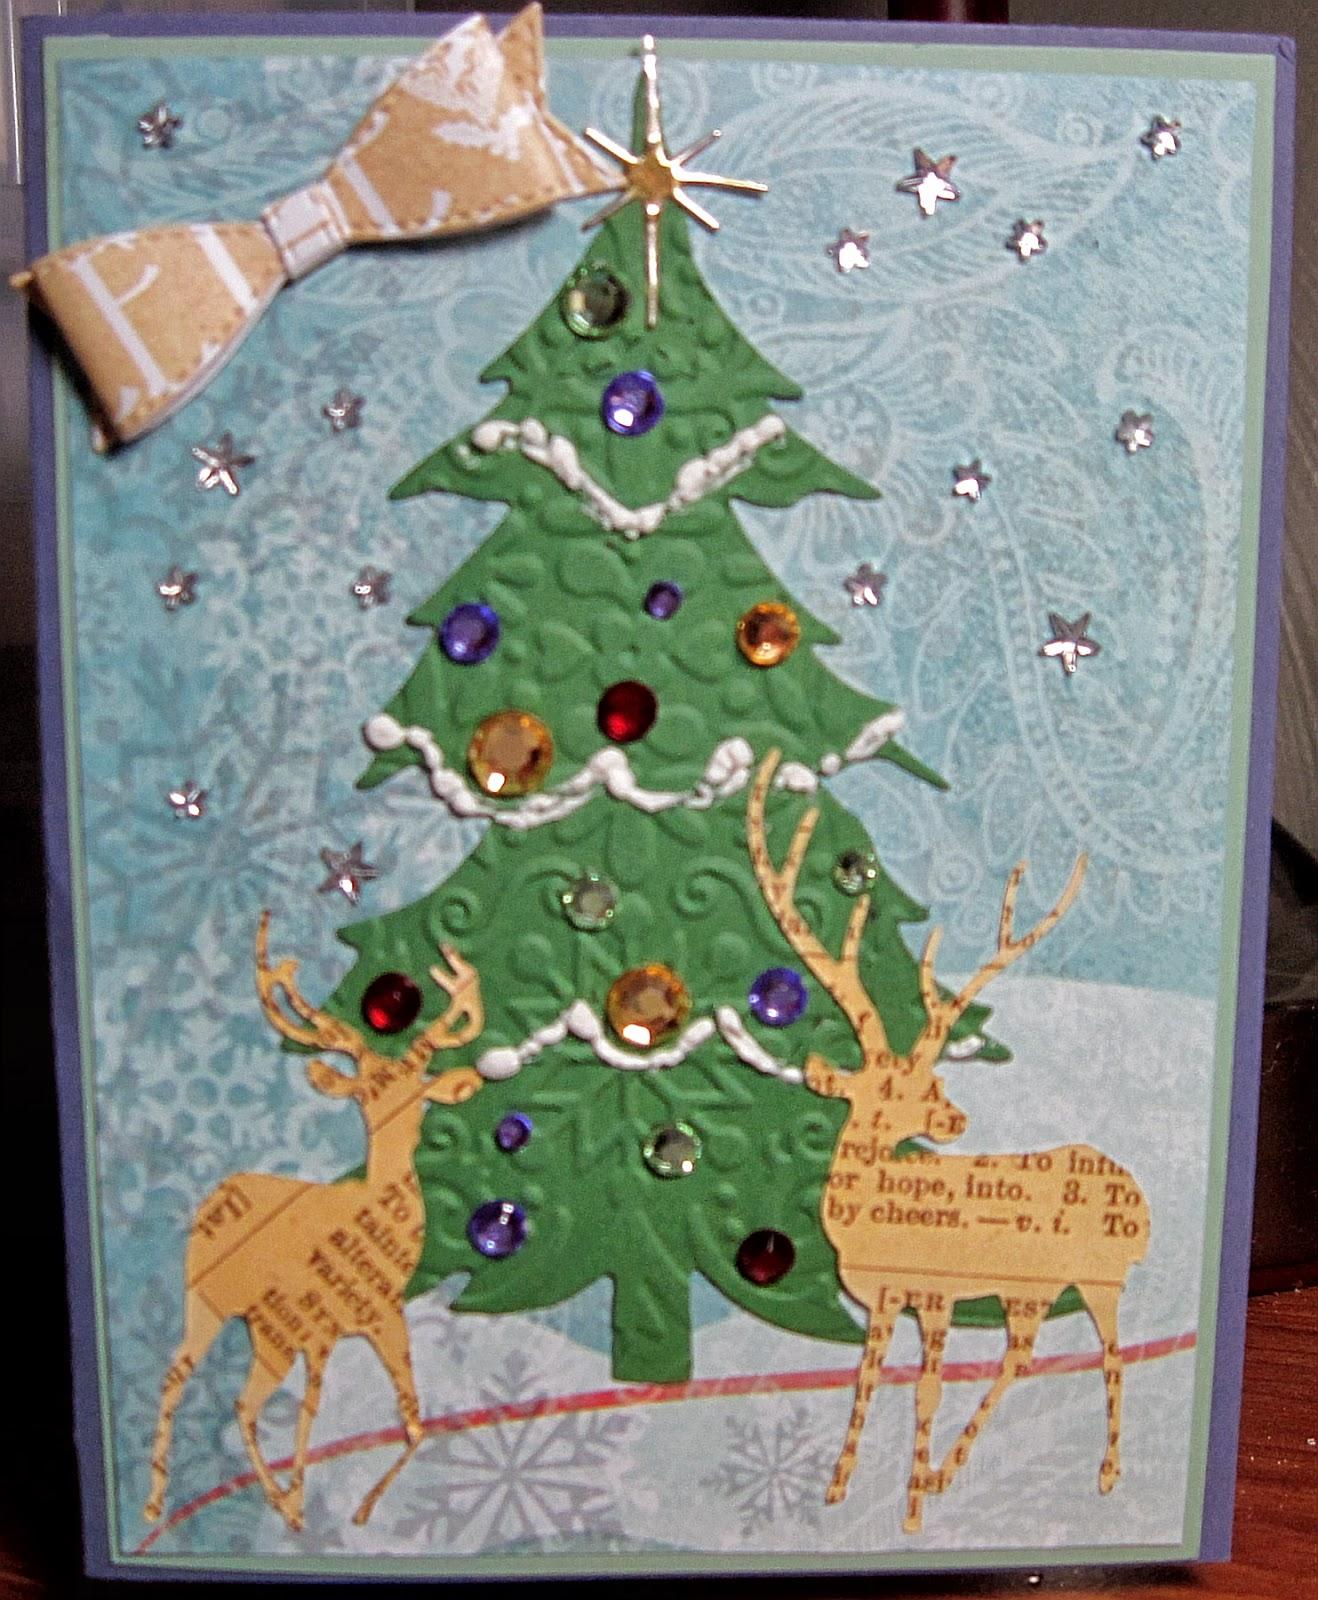 VILLAGE STAMPER RAMBLINGS: CCEE1350, Christmas Trees